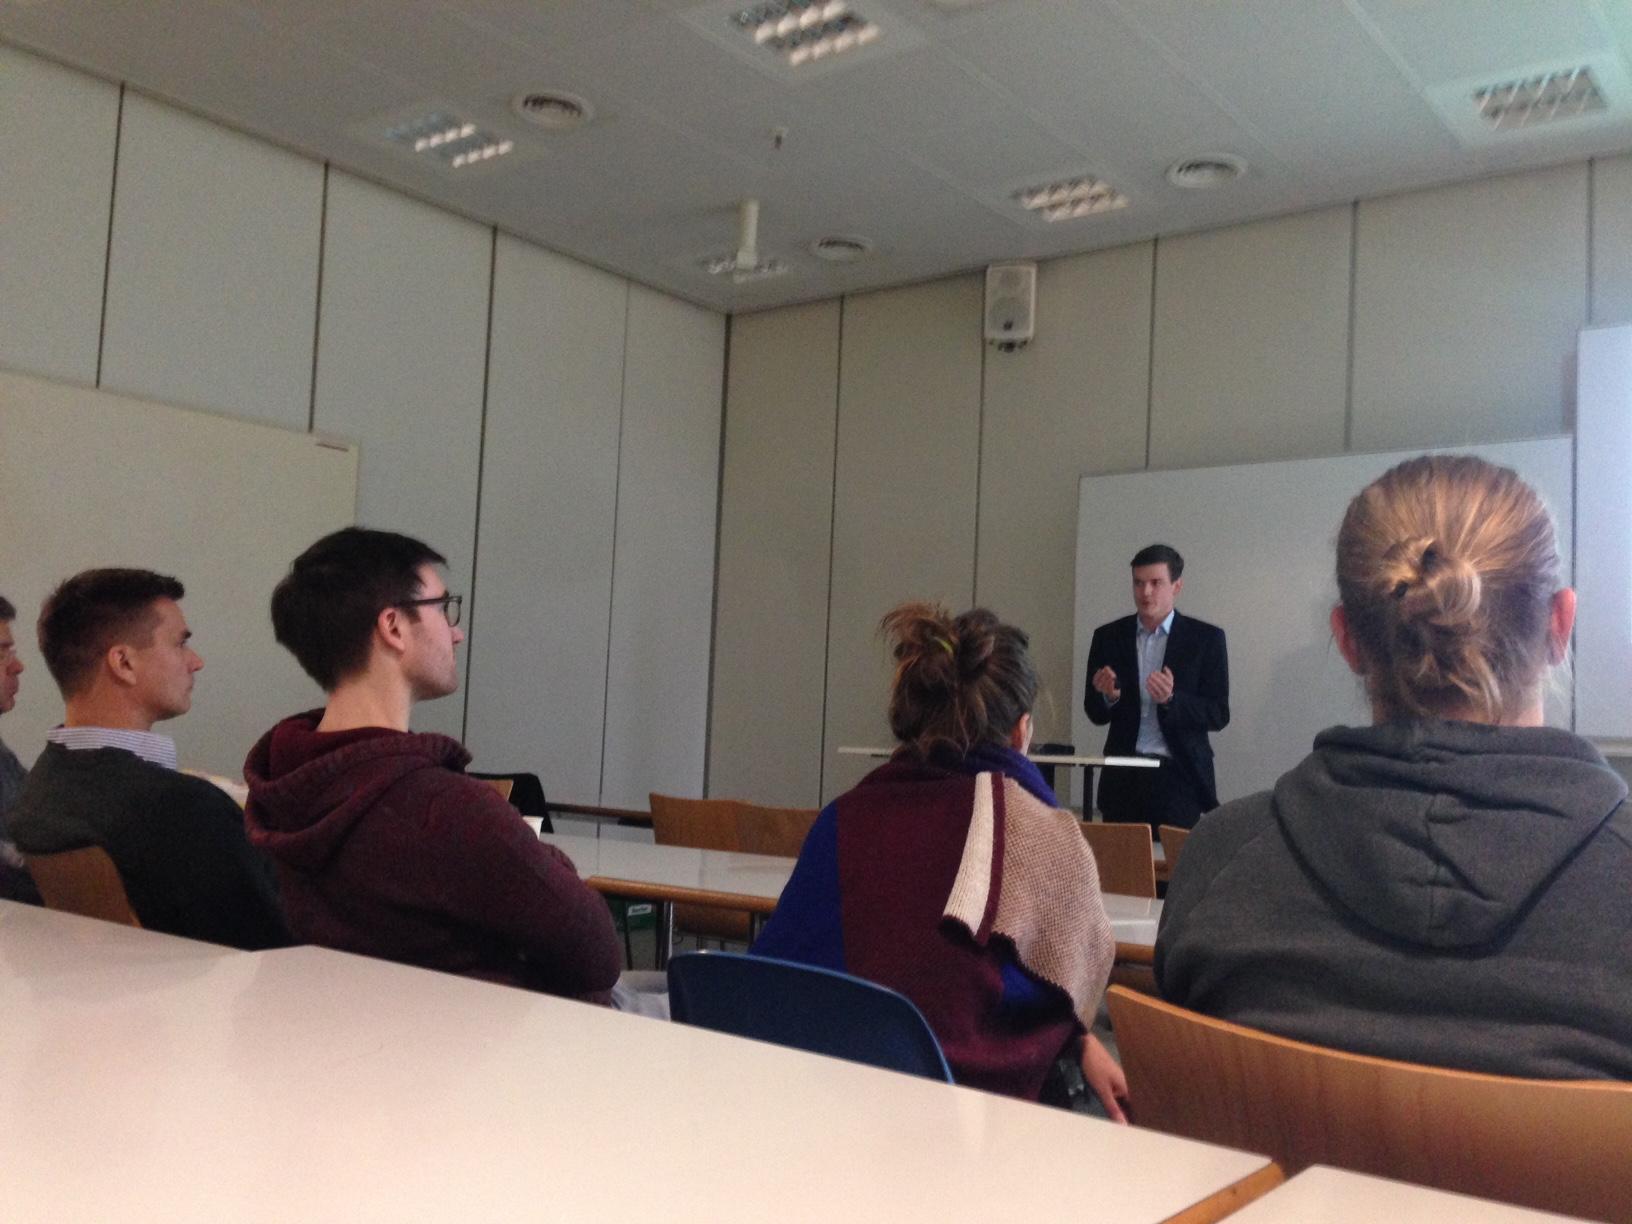 LaFTalks: Integrating Refugees via Suitable Knowledge Transfer for New Jobs